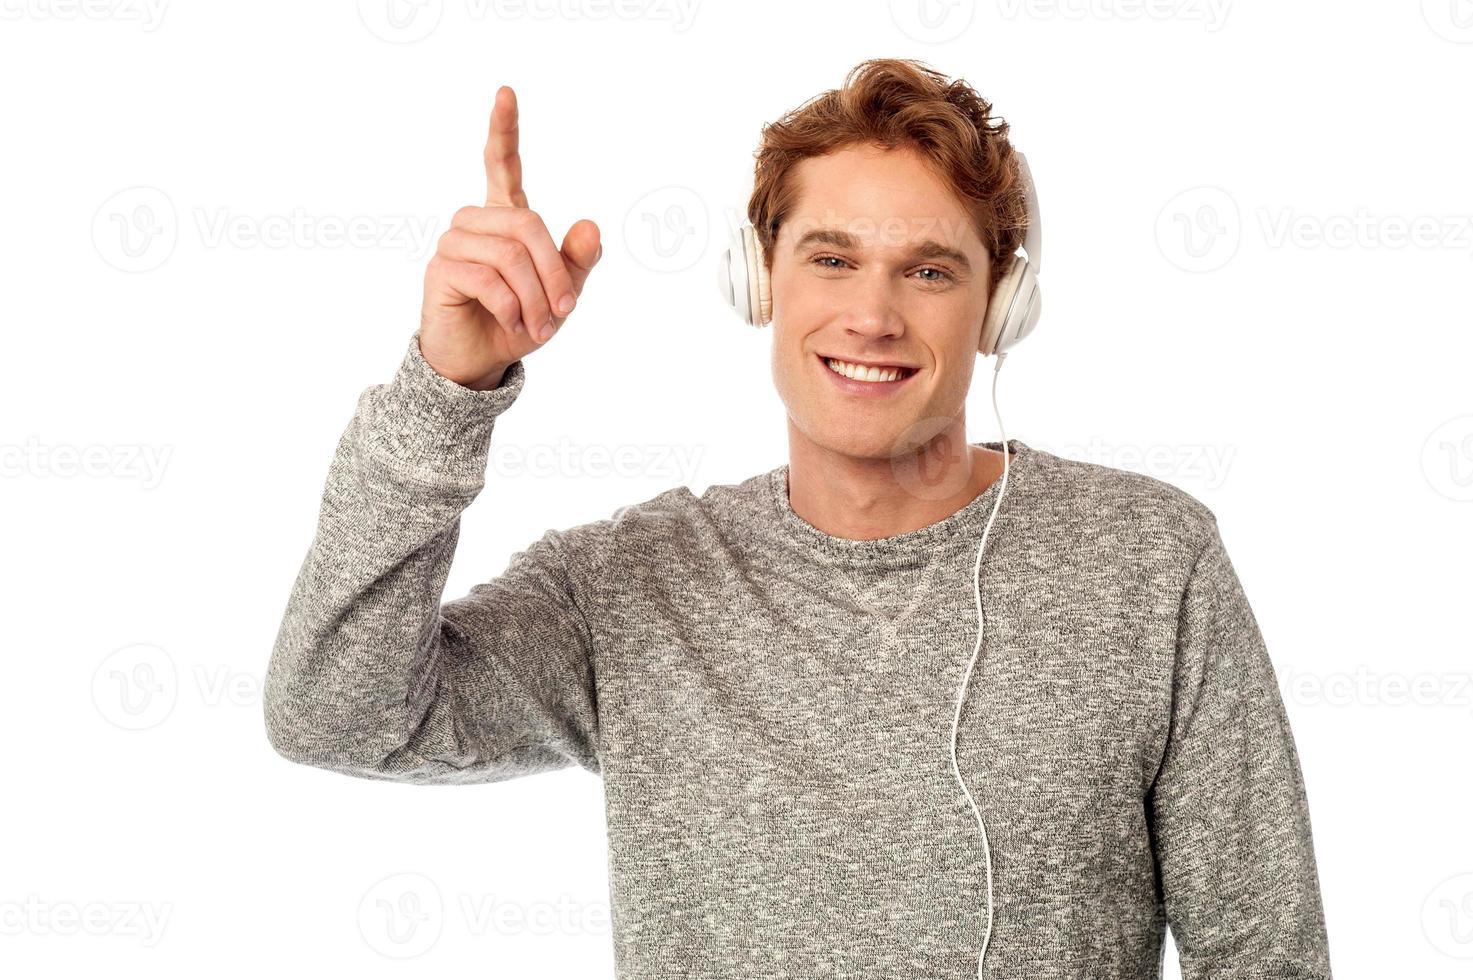 cooler junger hübscher Kerl, der Musik genießt foto